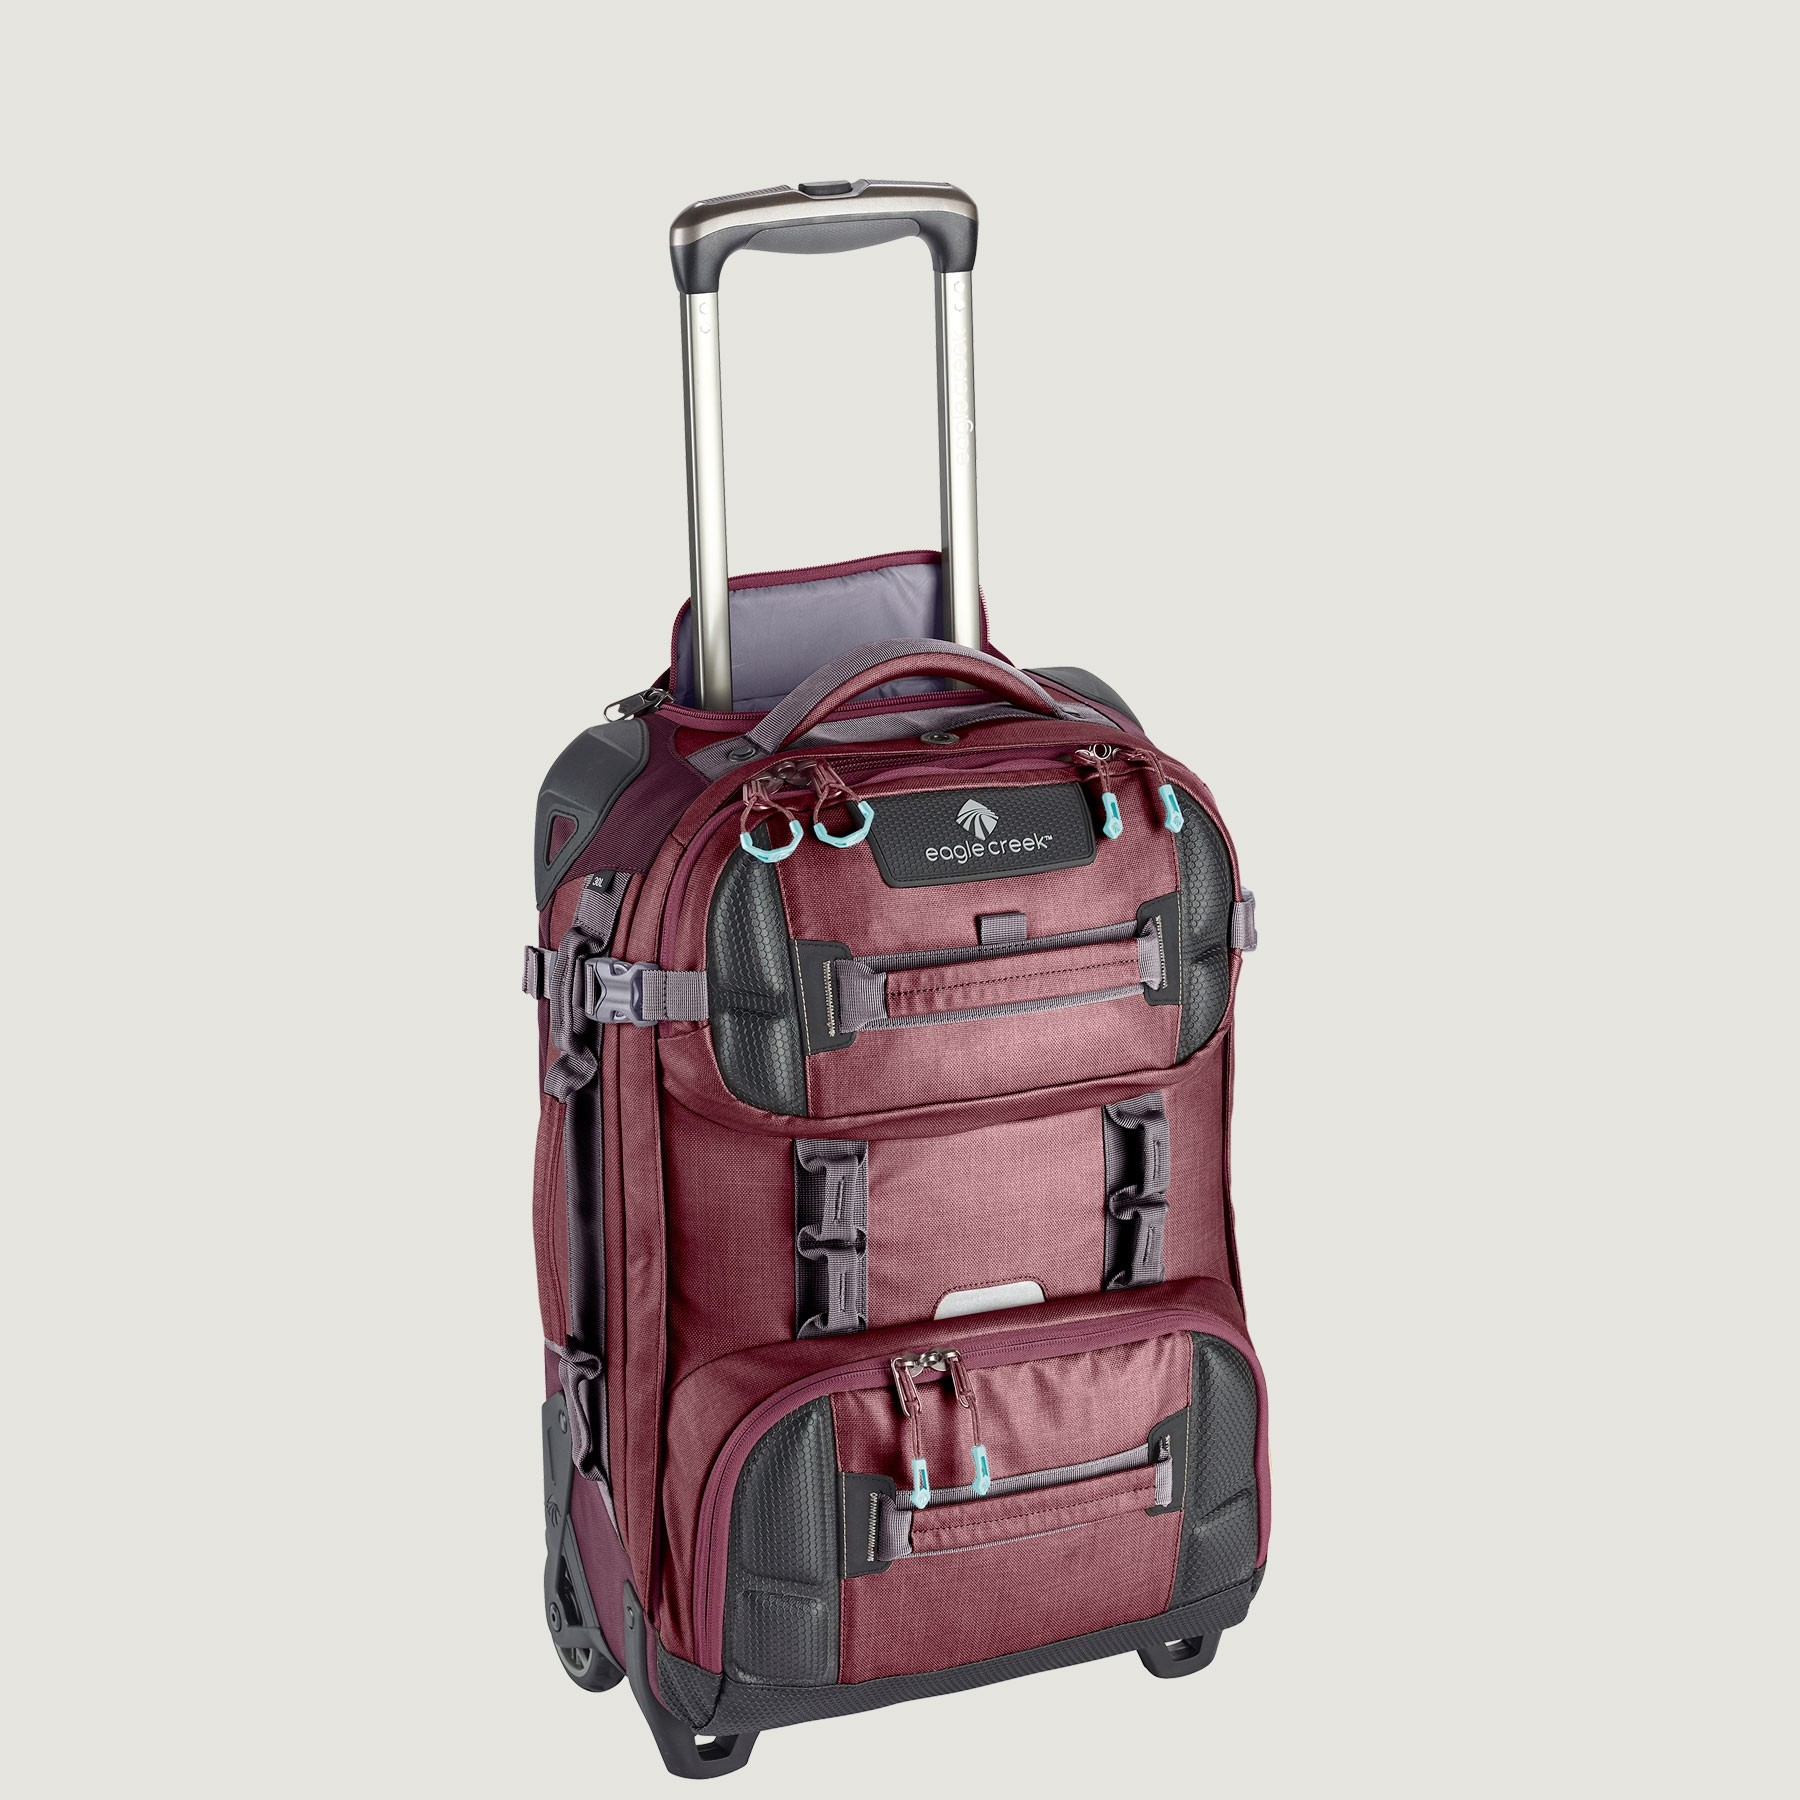 ORV Wheeled Duffel International Carry On